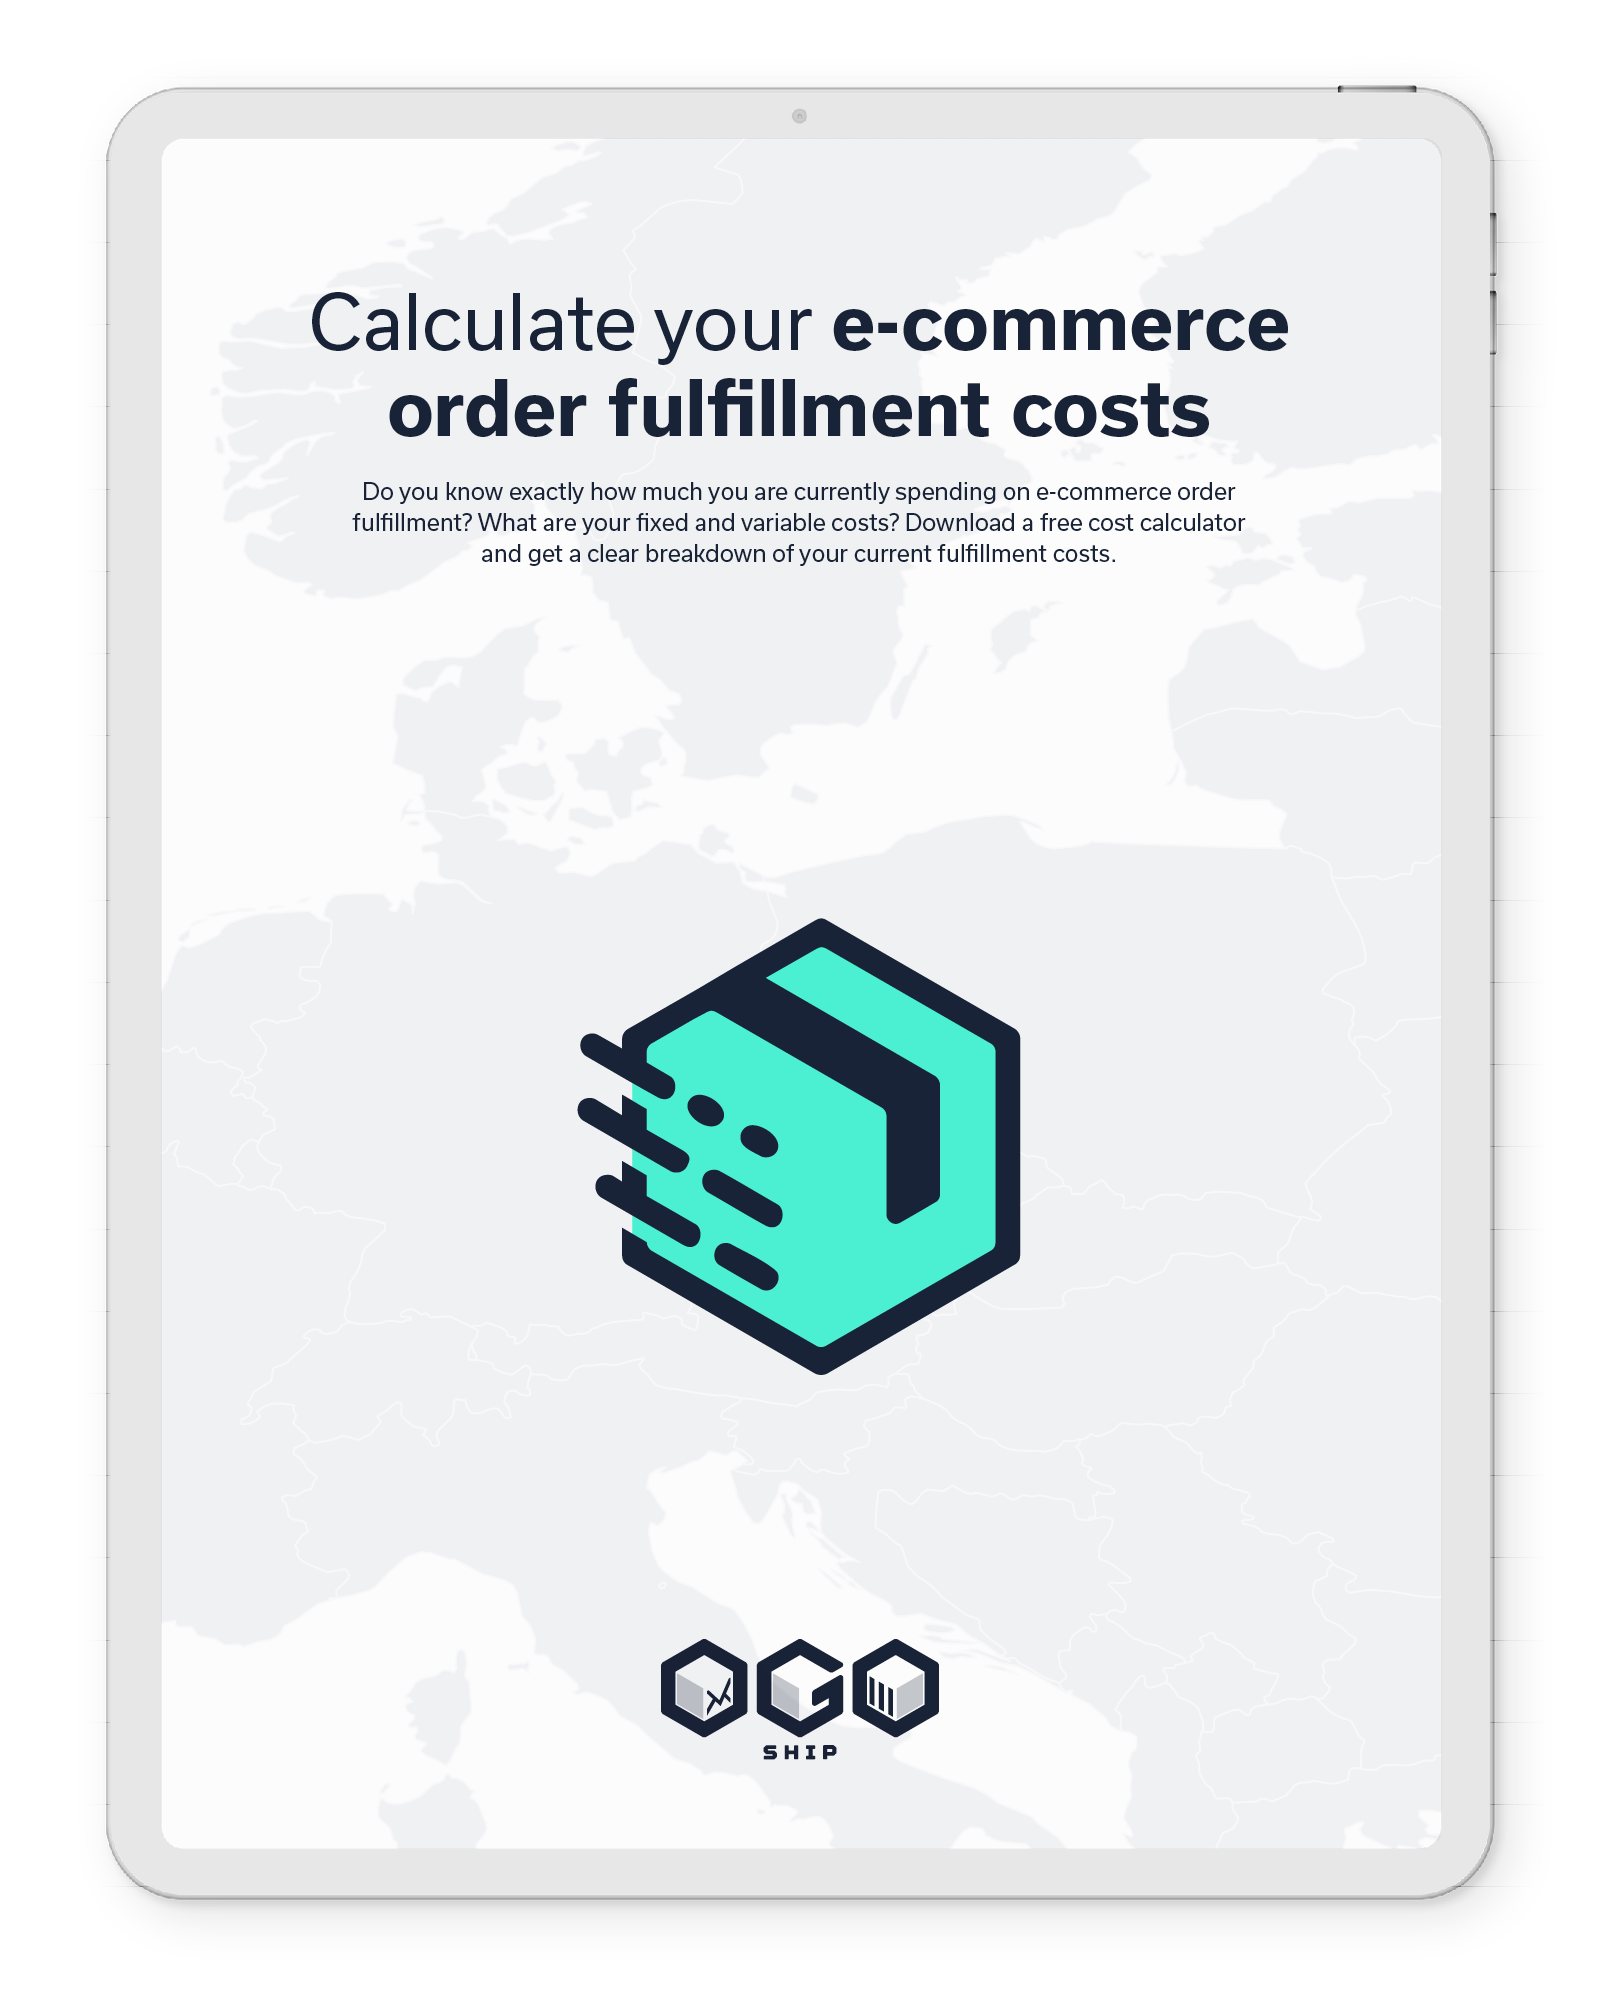 E-commerce Order Fulfillment Calculator | OGOship